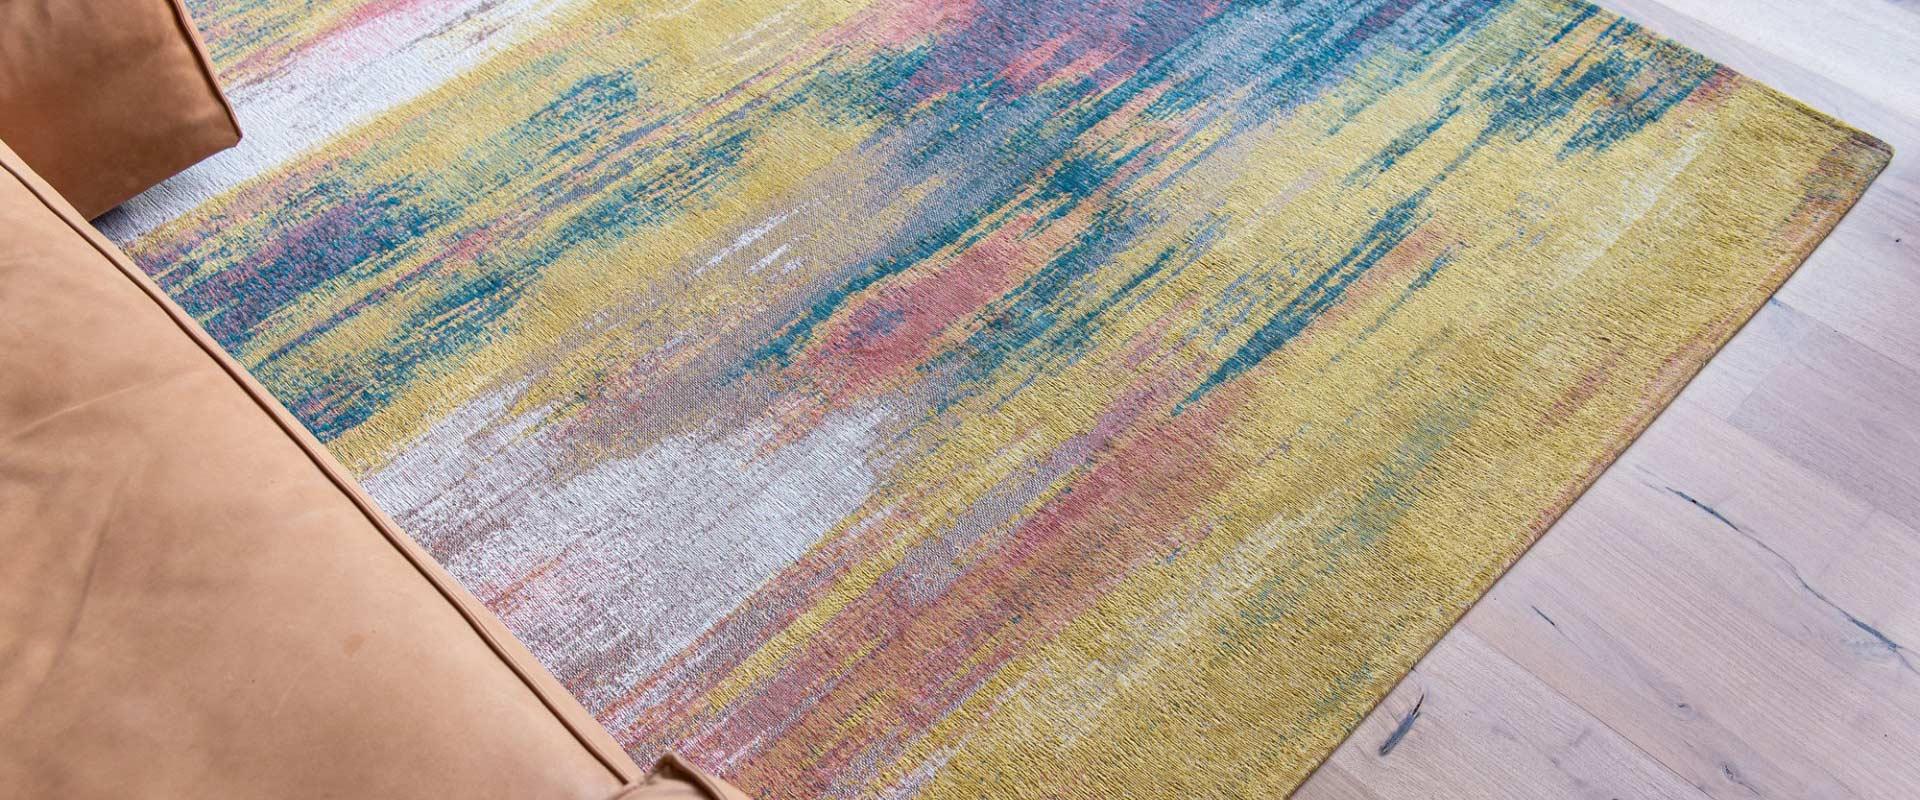 carpette-diapo-image-2